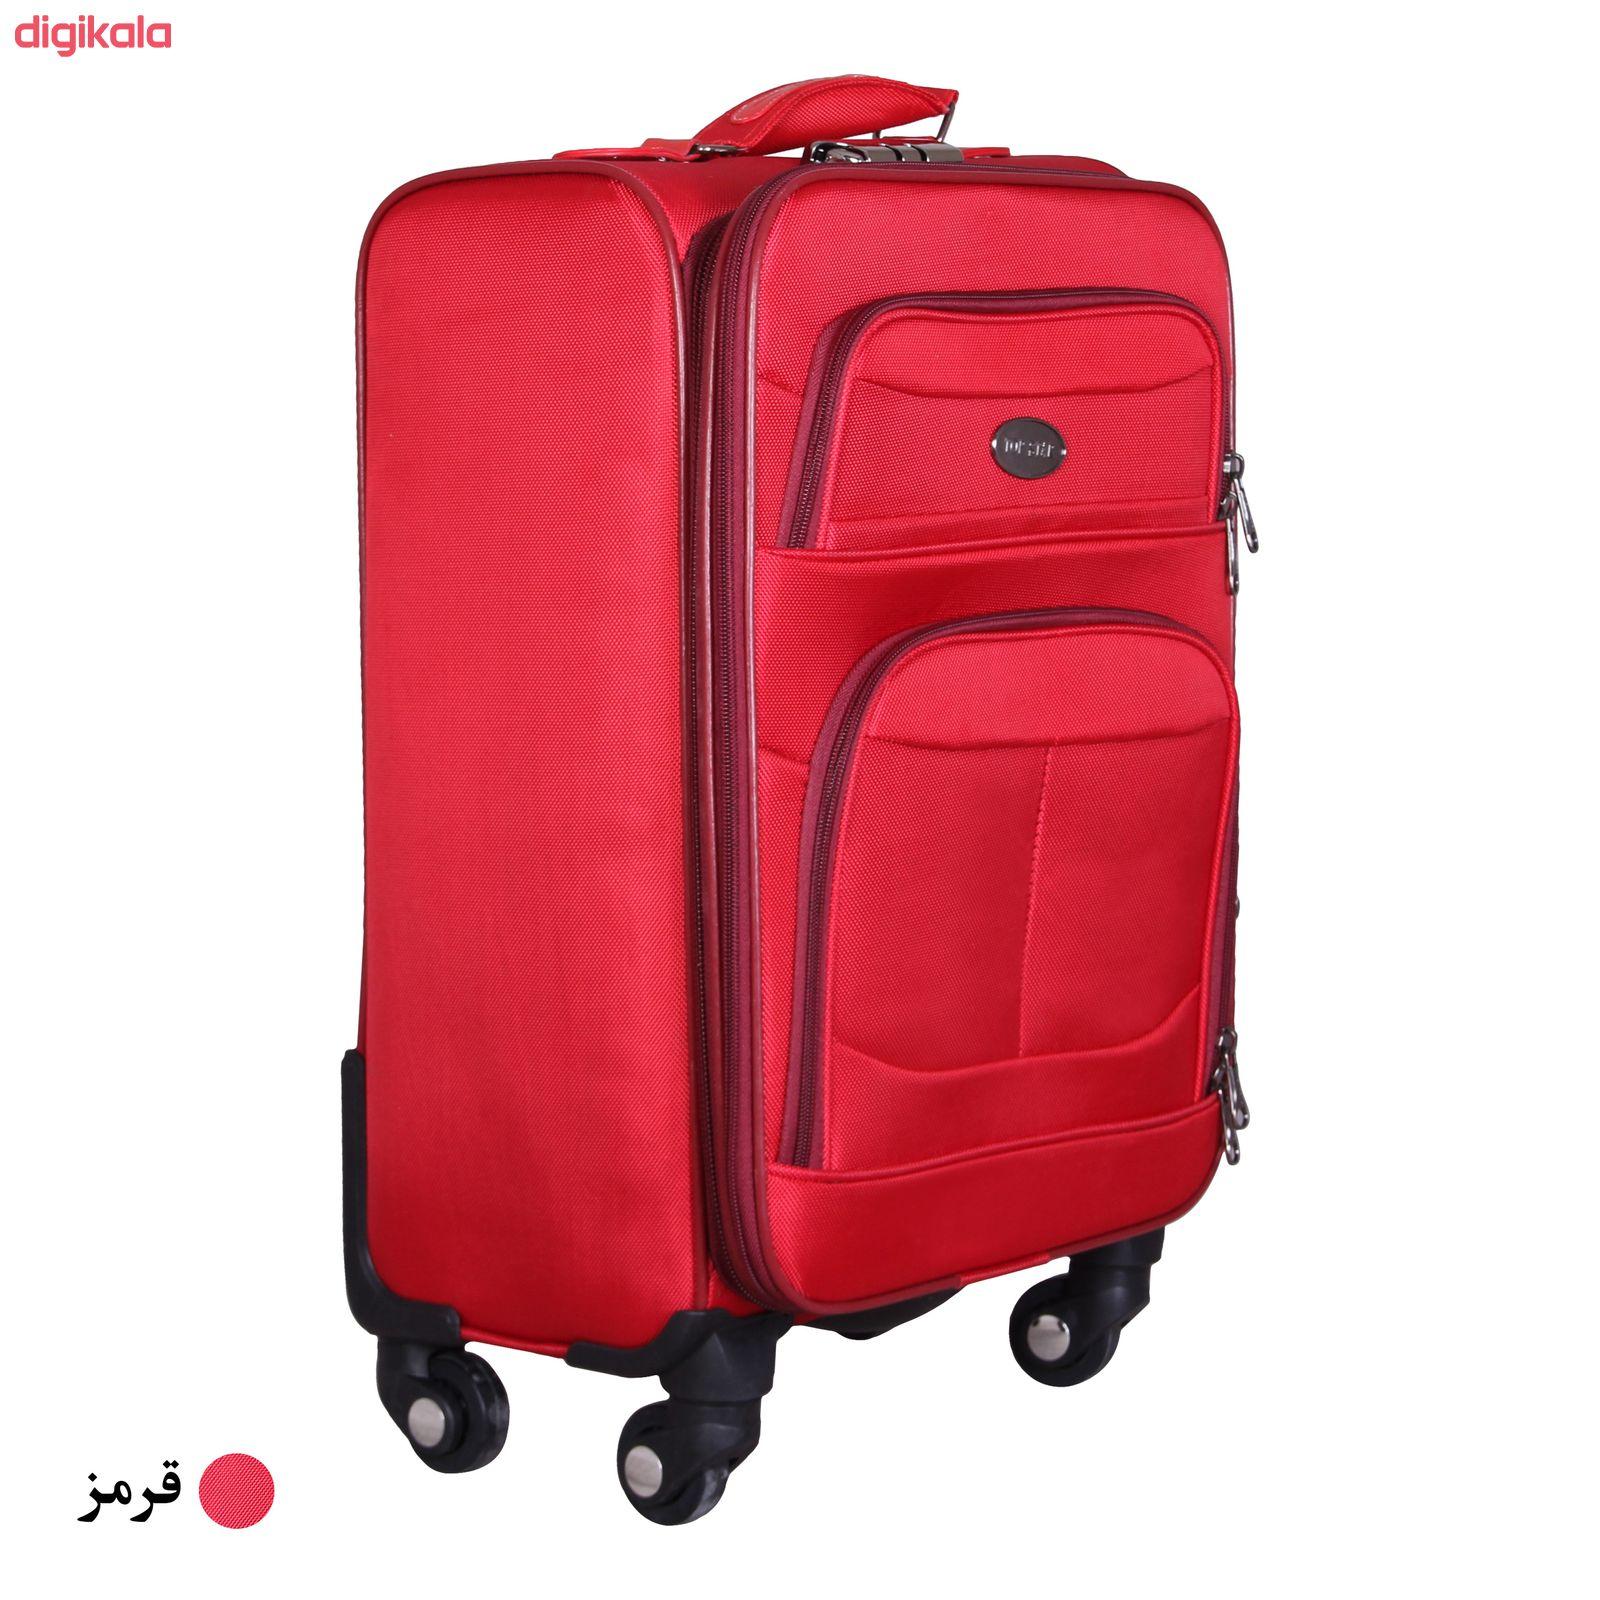 مجموعه سه عددی چمدان کدA1034 main 1 8